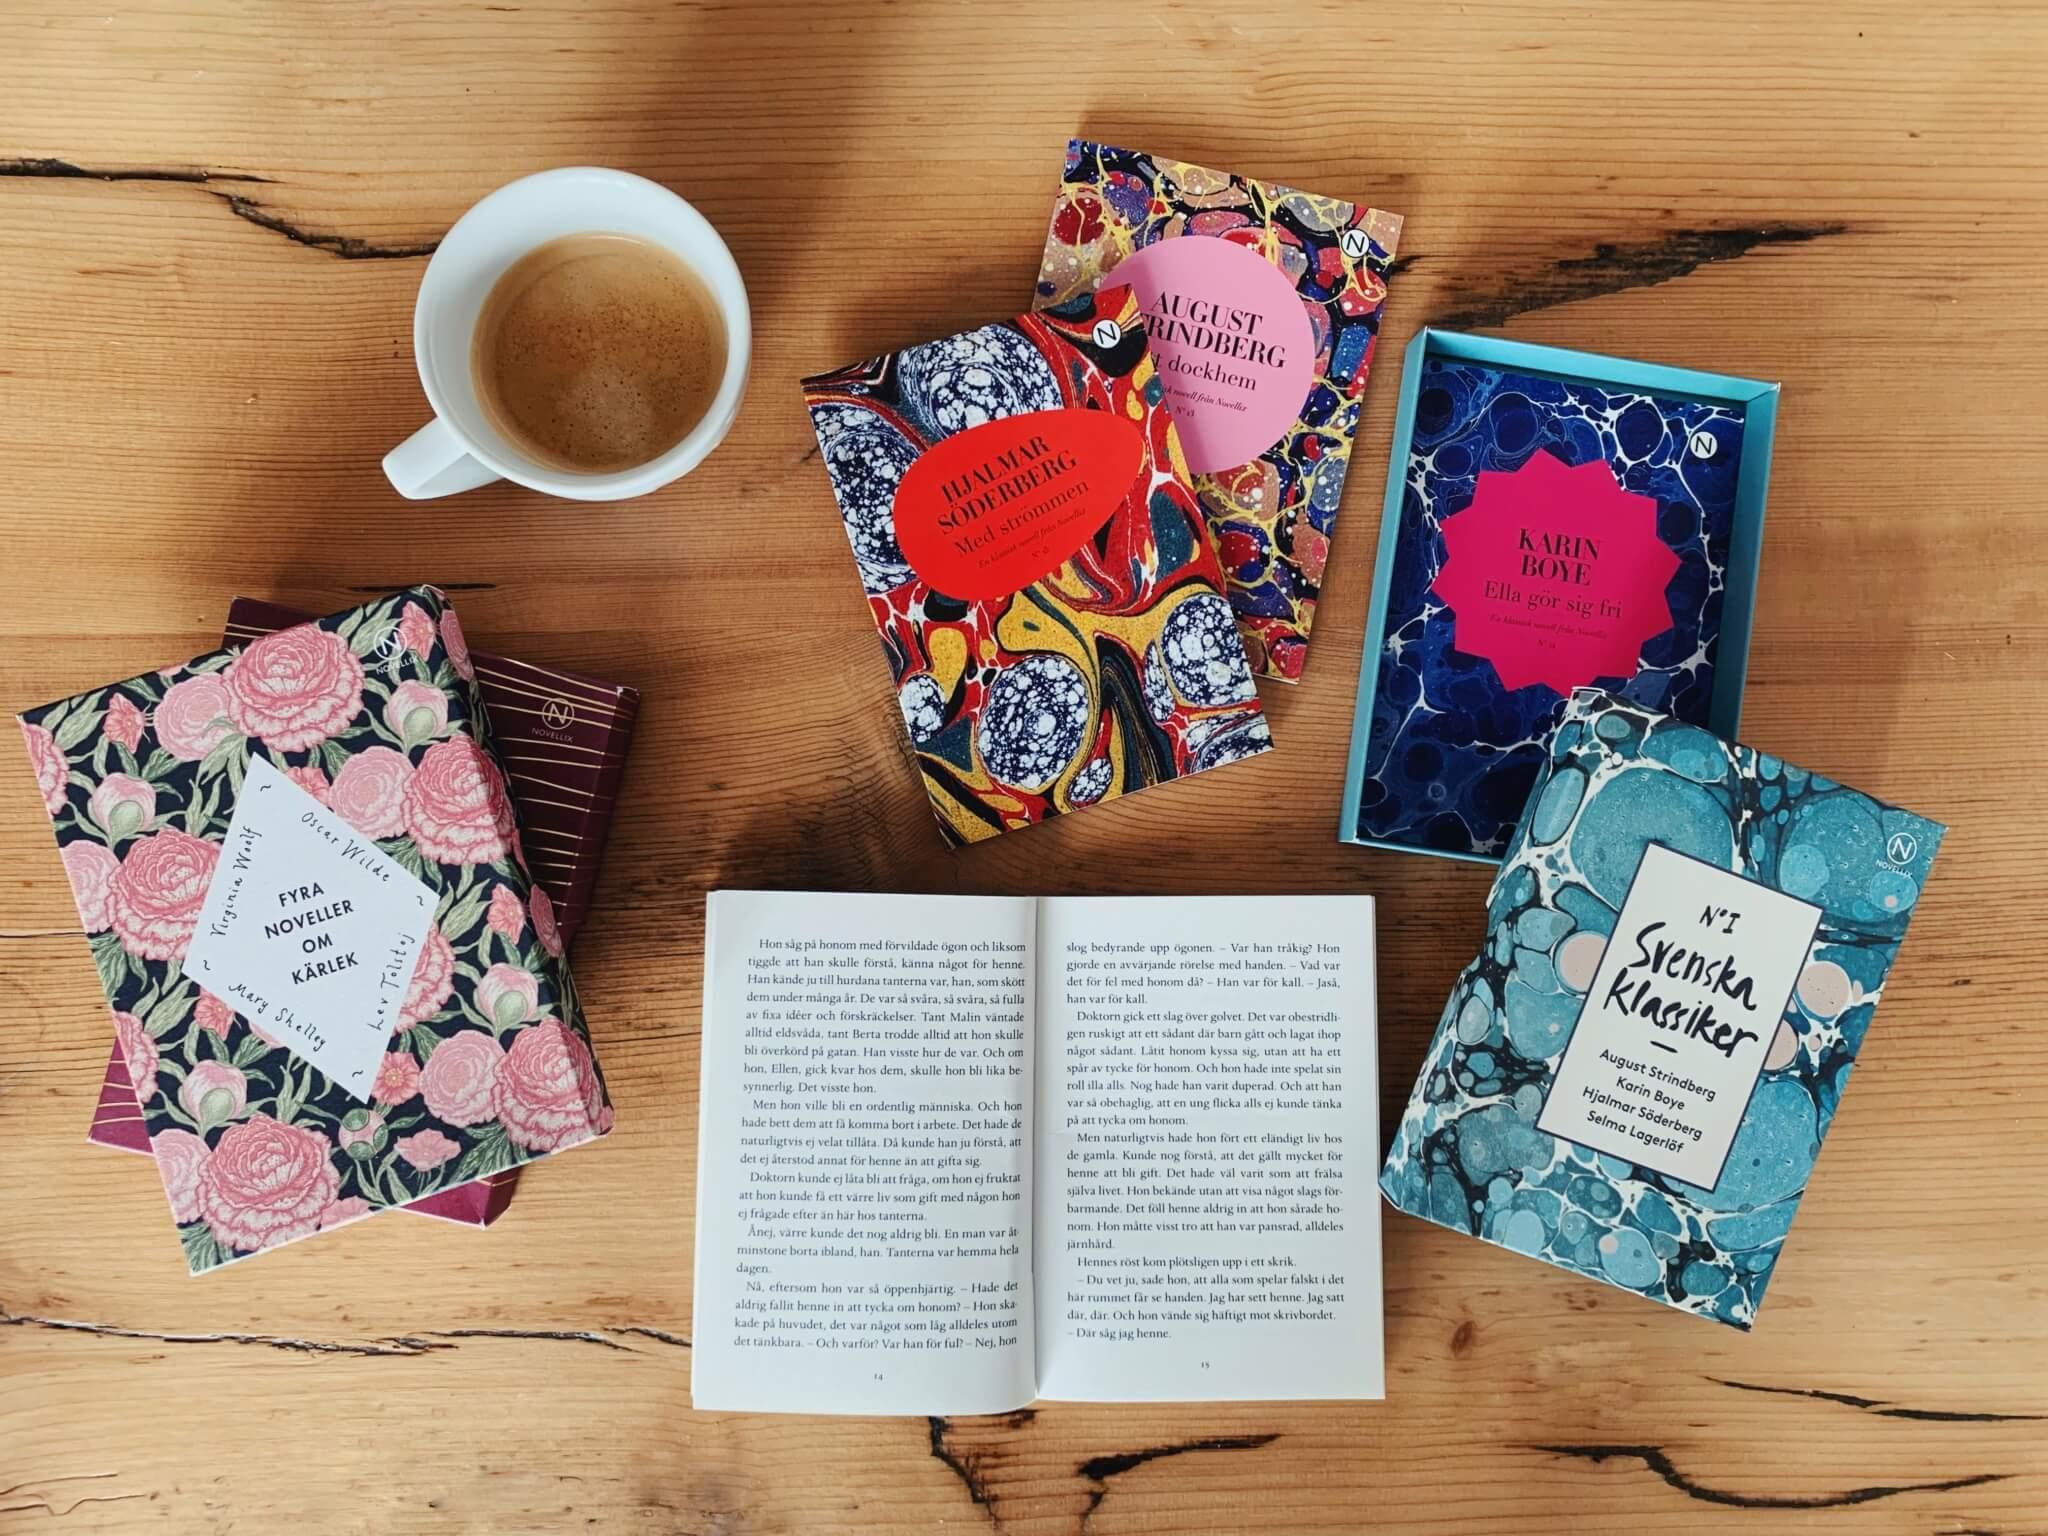 kaffekopp och flera novellix-askar